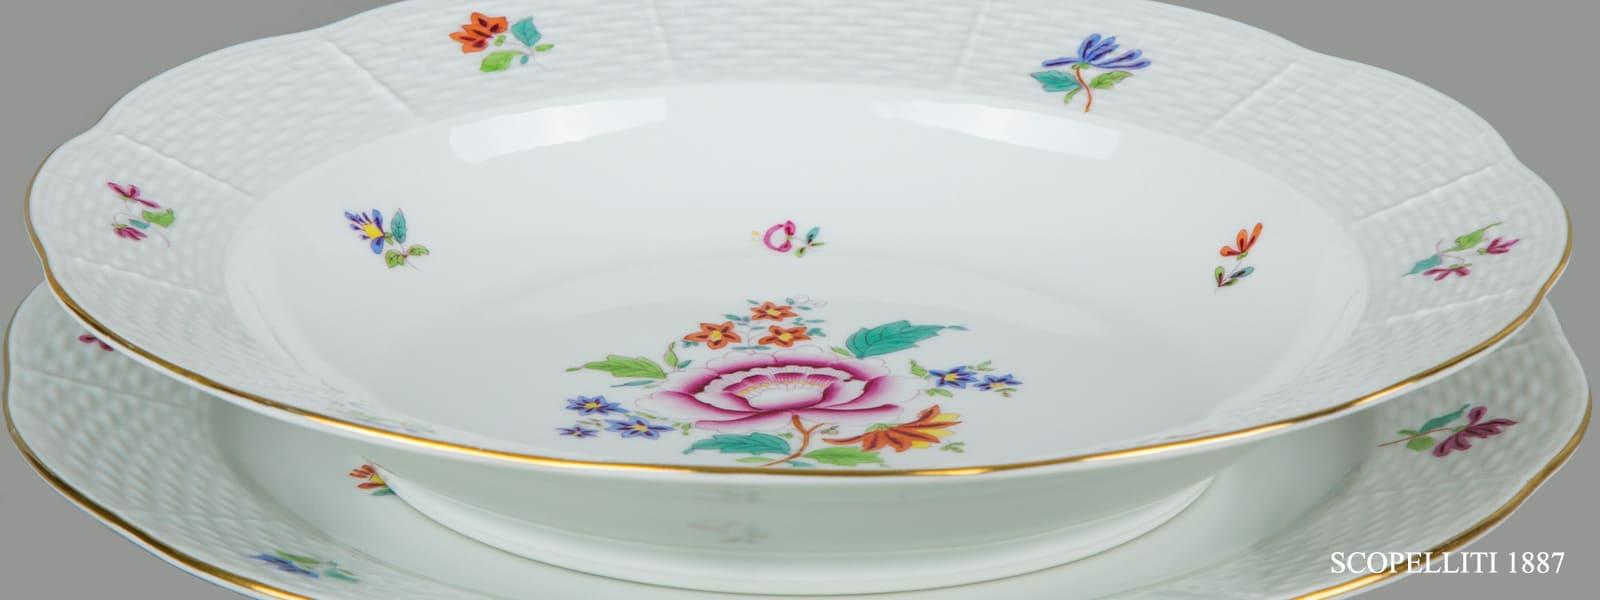 Porcellane herend decoro fiori nanking bouquet NB peonia cinese